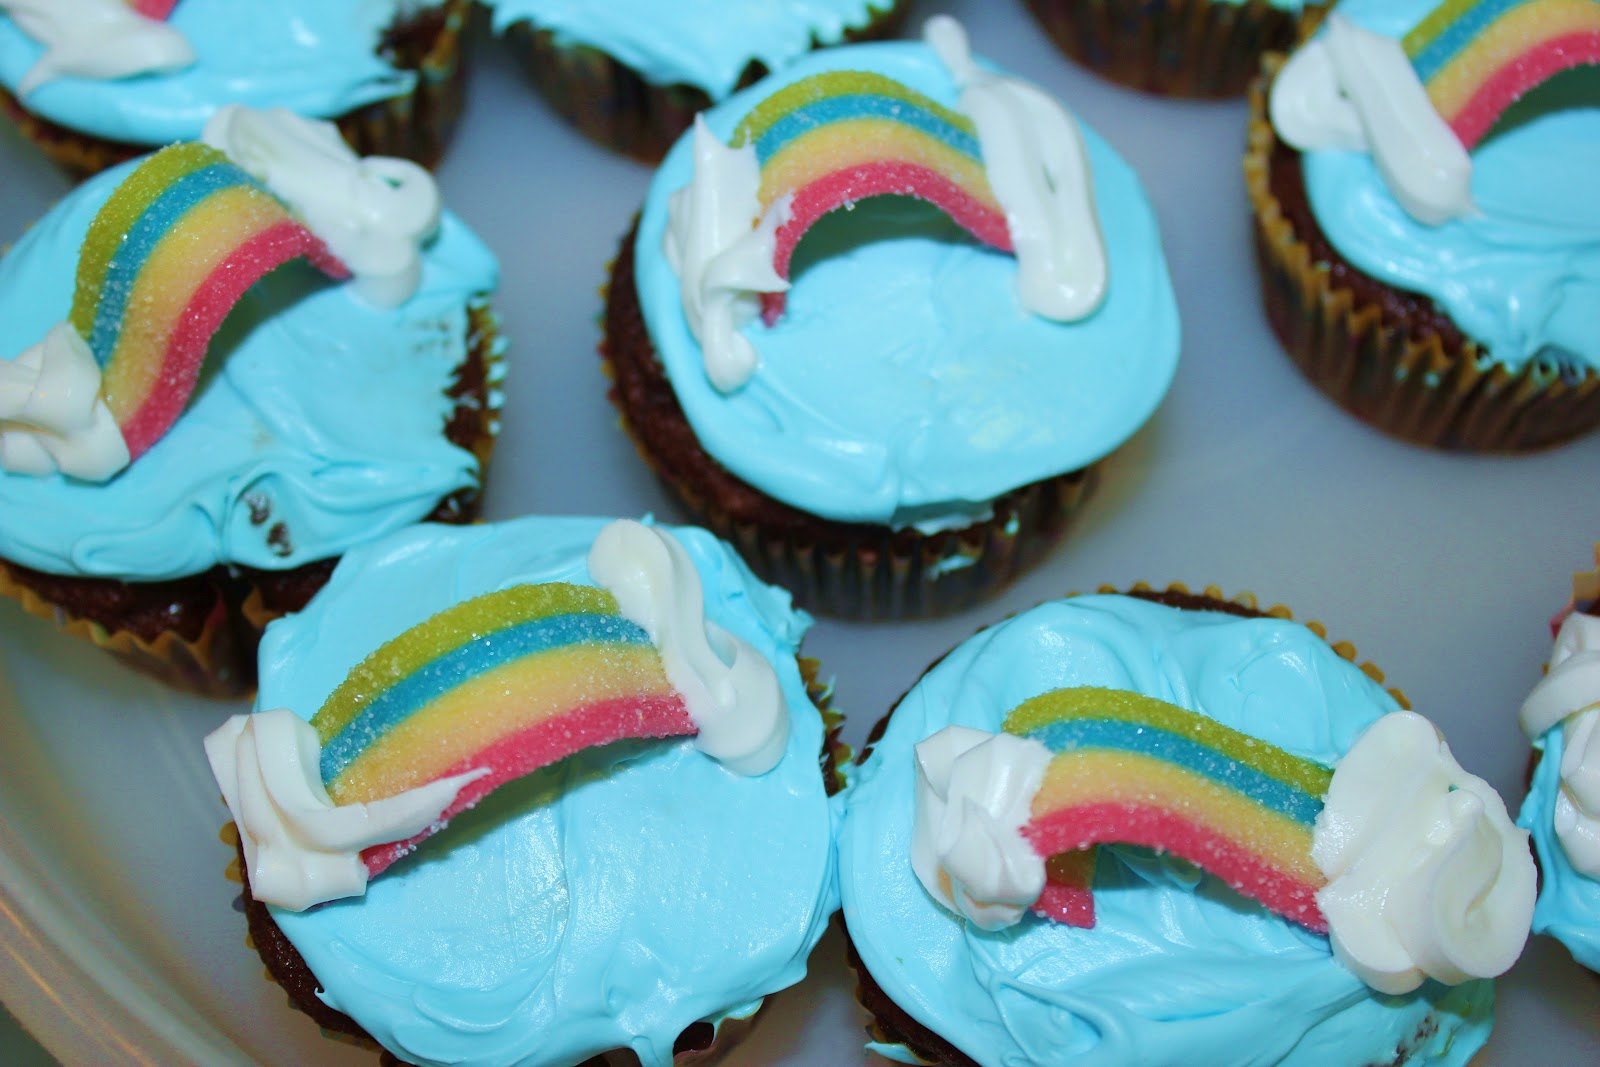 http://1.bp.blogspot.com/-F-3n4VvhY9E/T2p8944v7bI/AAAAAAAAB8w/OfD4kGTuCB0/s1600/Cupcakes+Rainbow.JPG